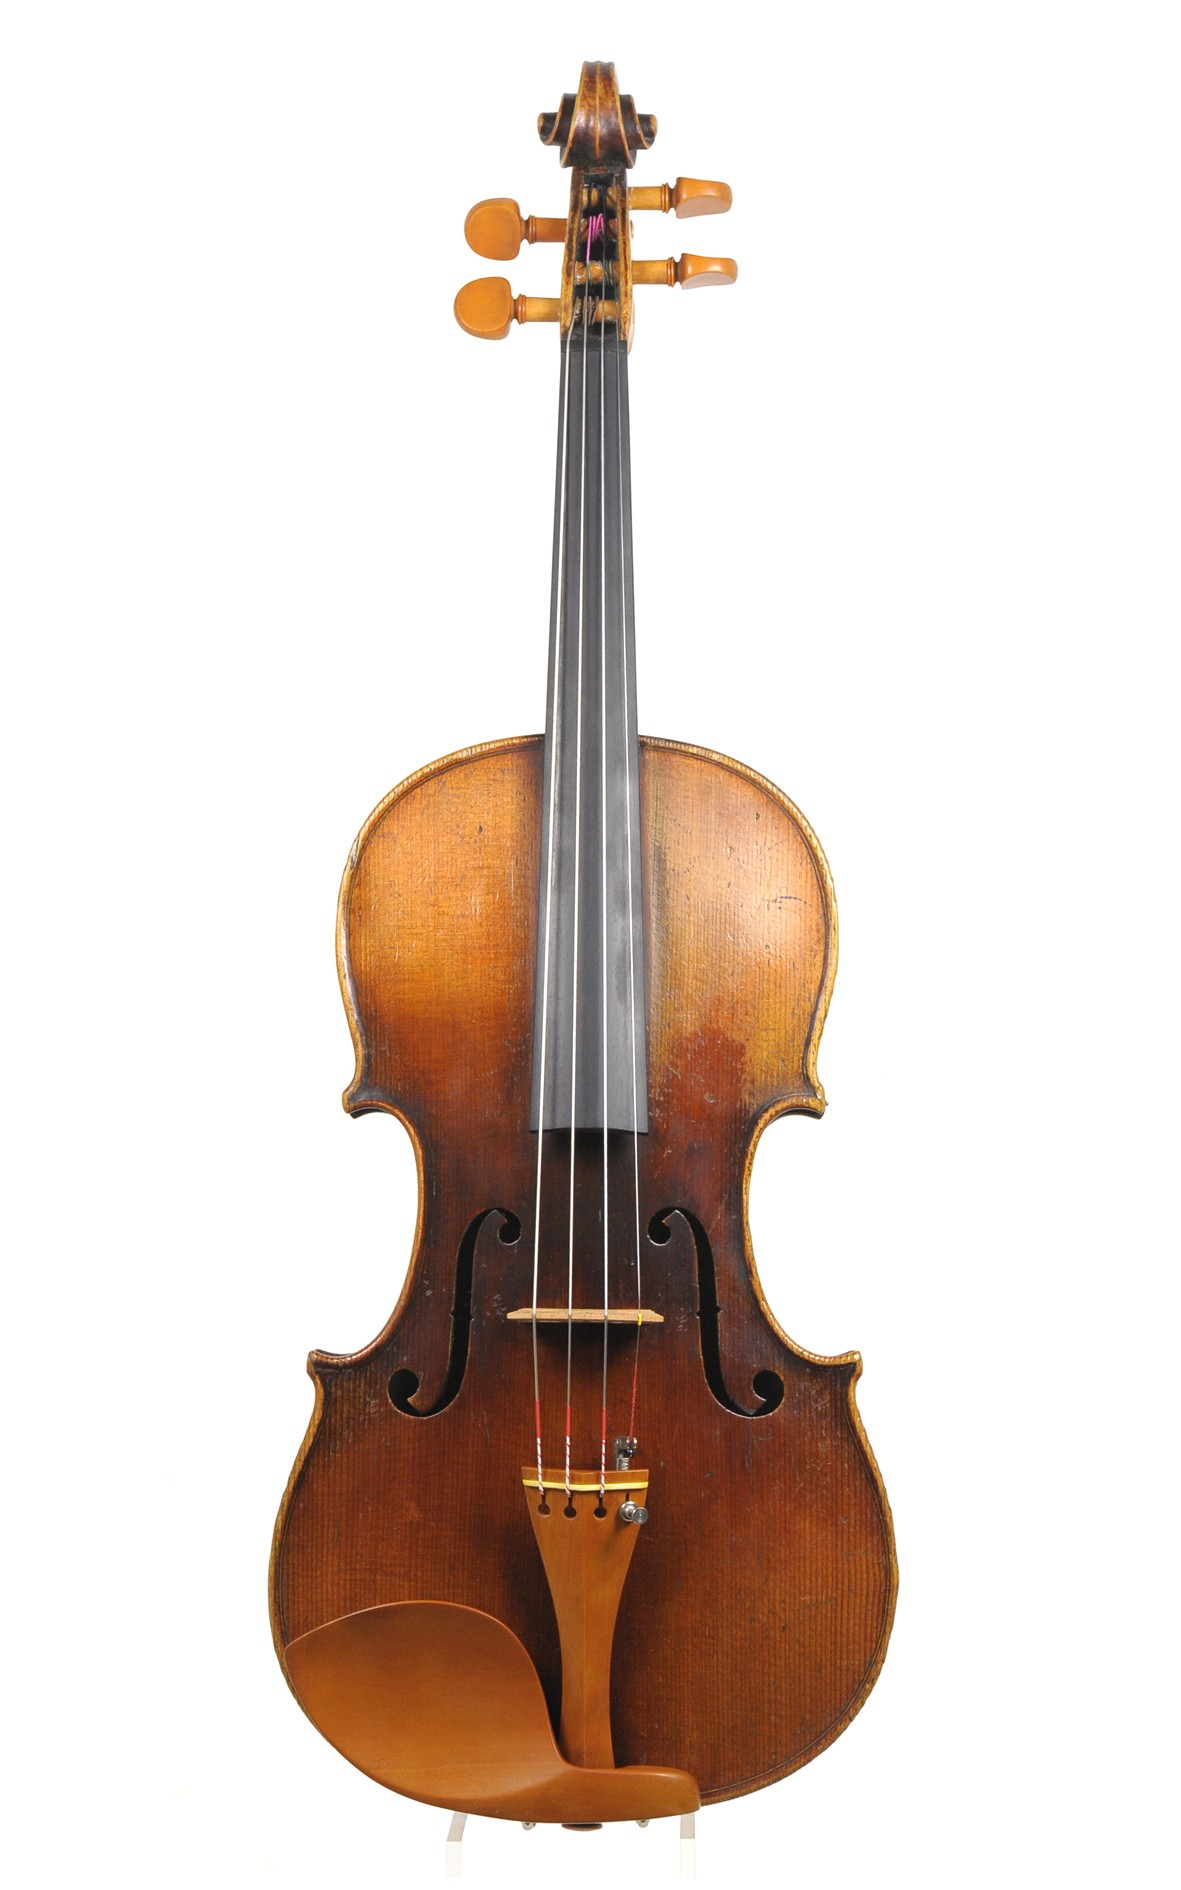 Attractive antique German violin after Stradivarius - mellow, sweet sound